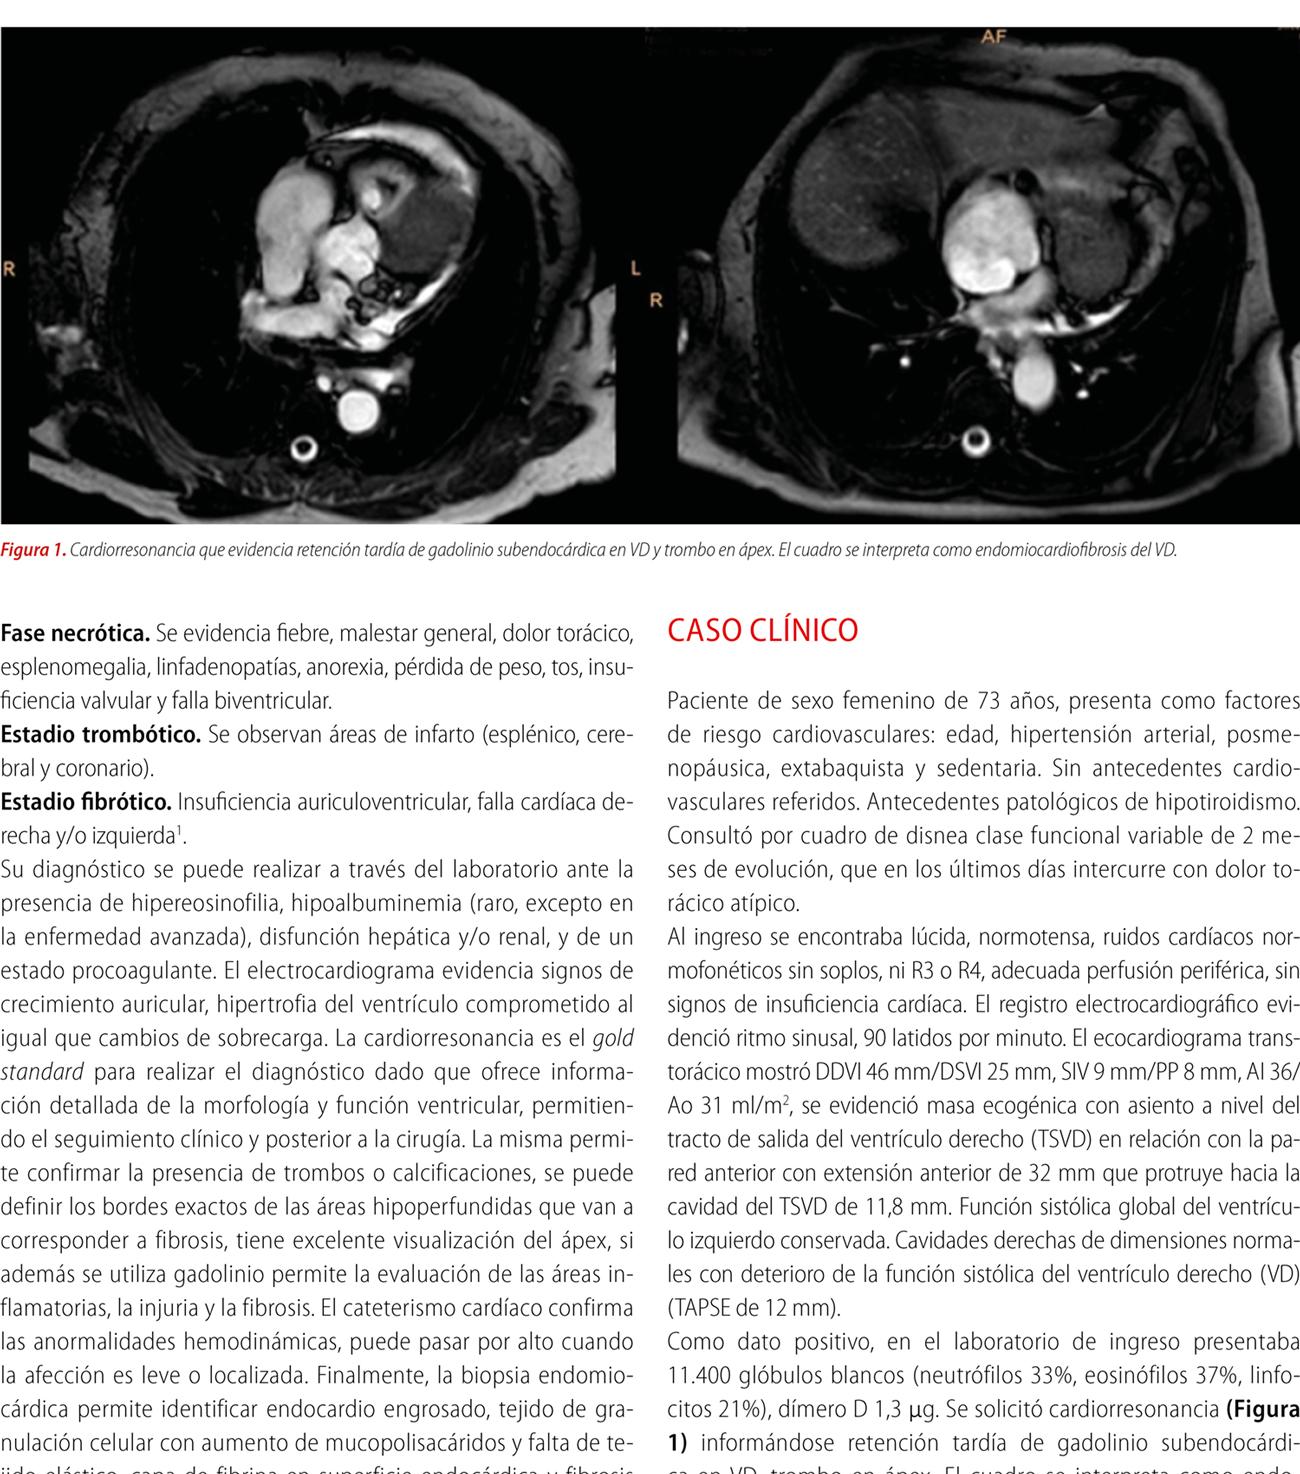 Endomiocardiofibrosis